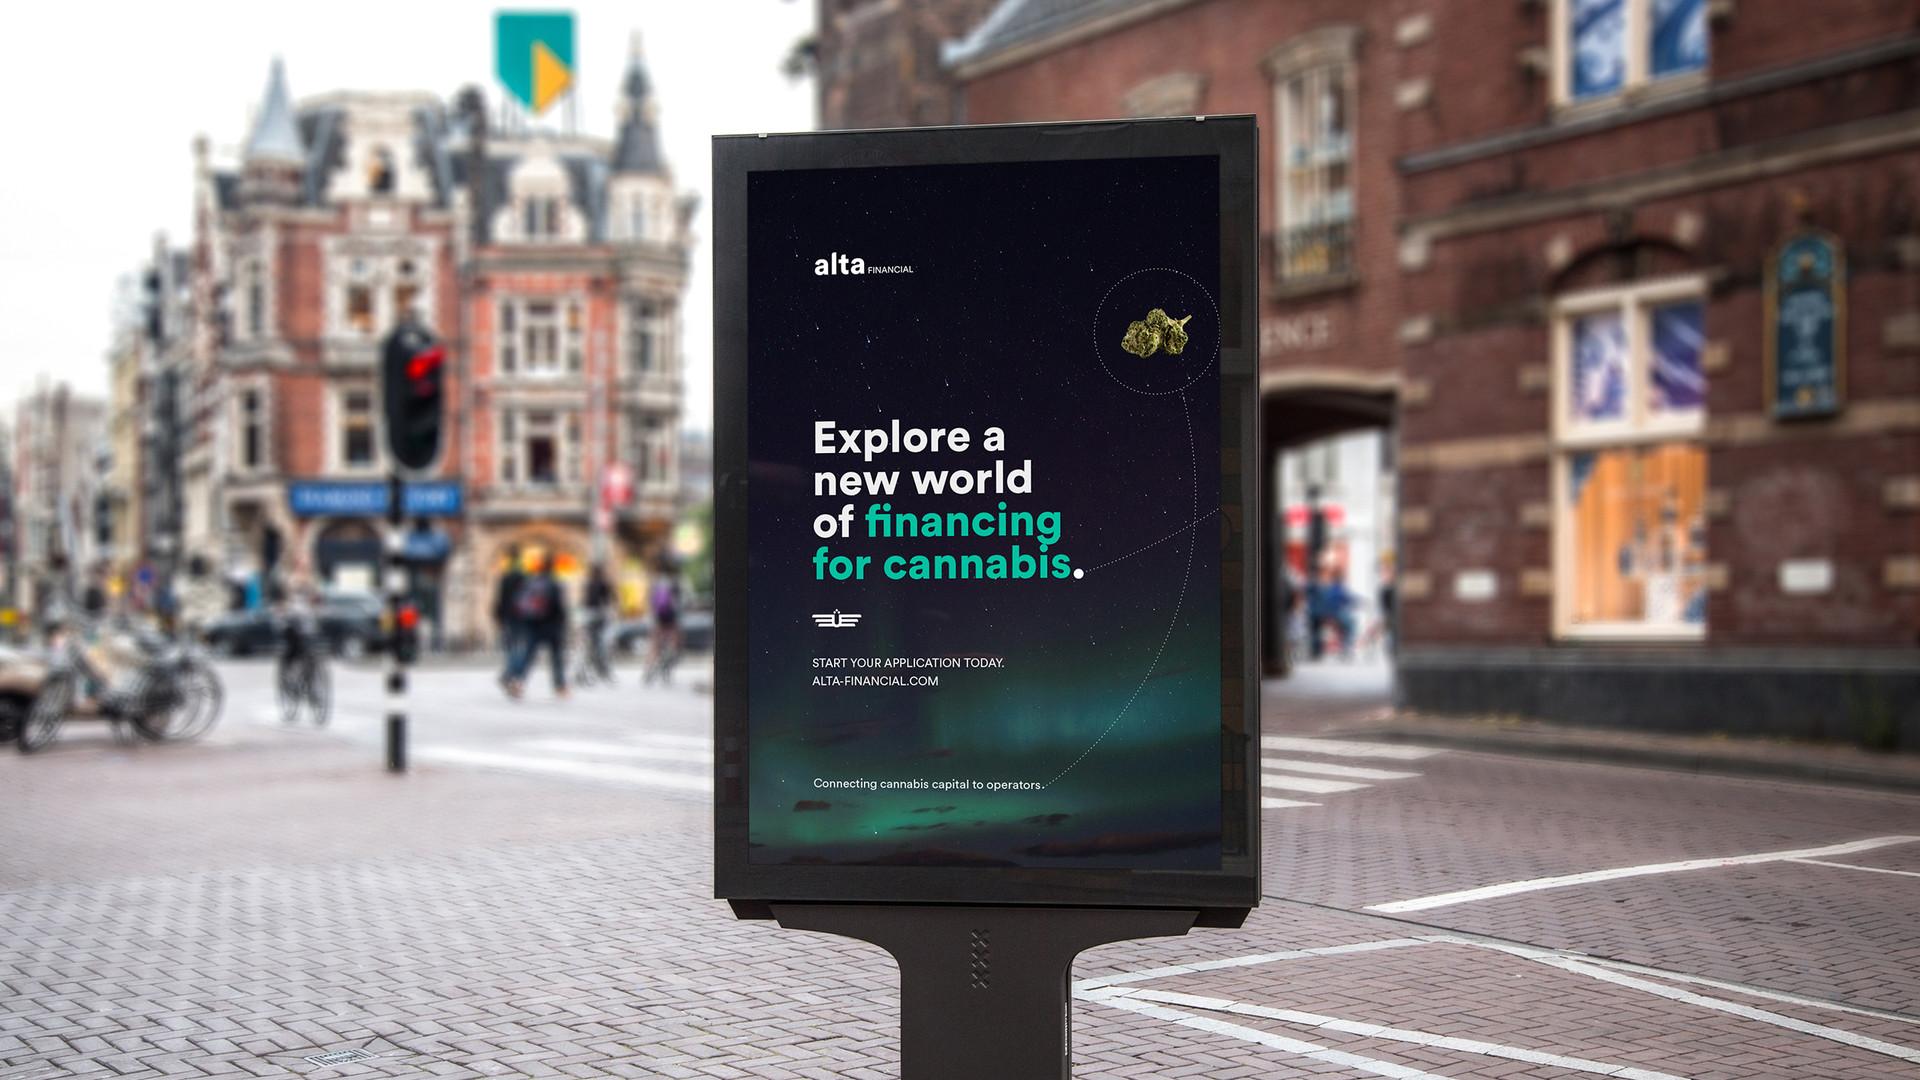 Alta Financial: Brand Strategy & Design